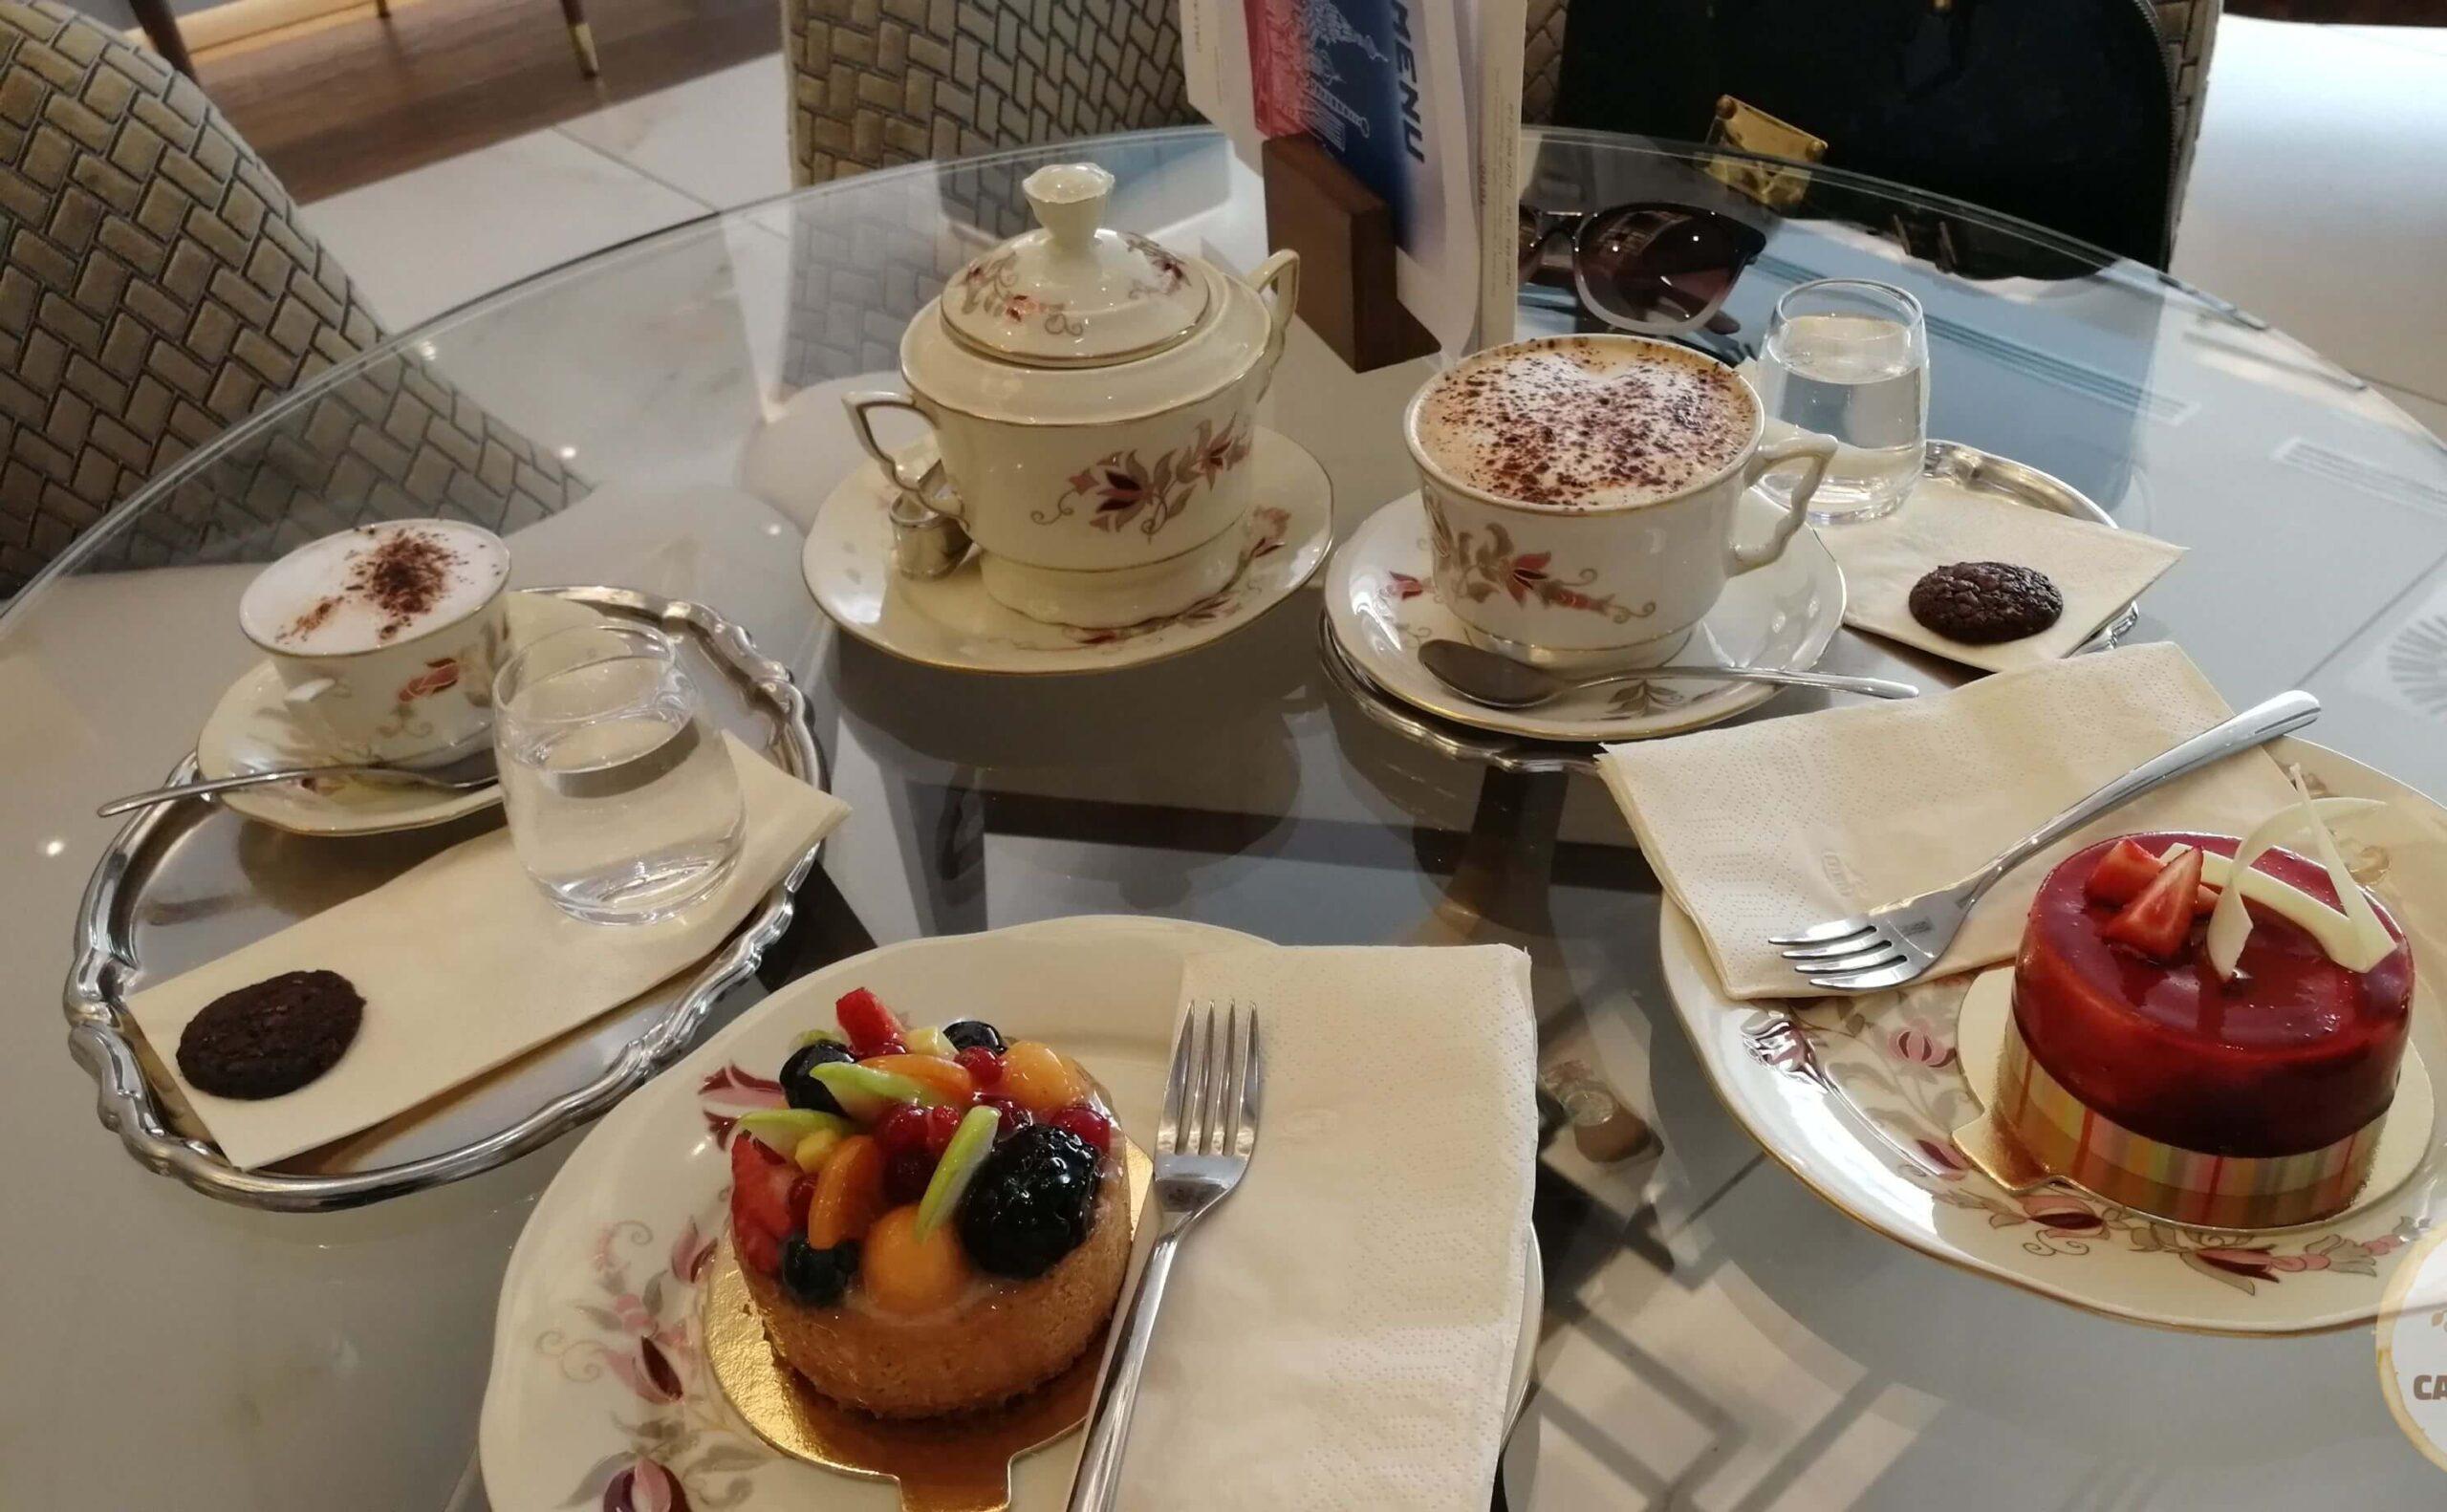 zsolnay בתי קפה בבודפשט בית קפה ז'ולנאי